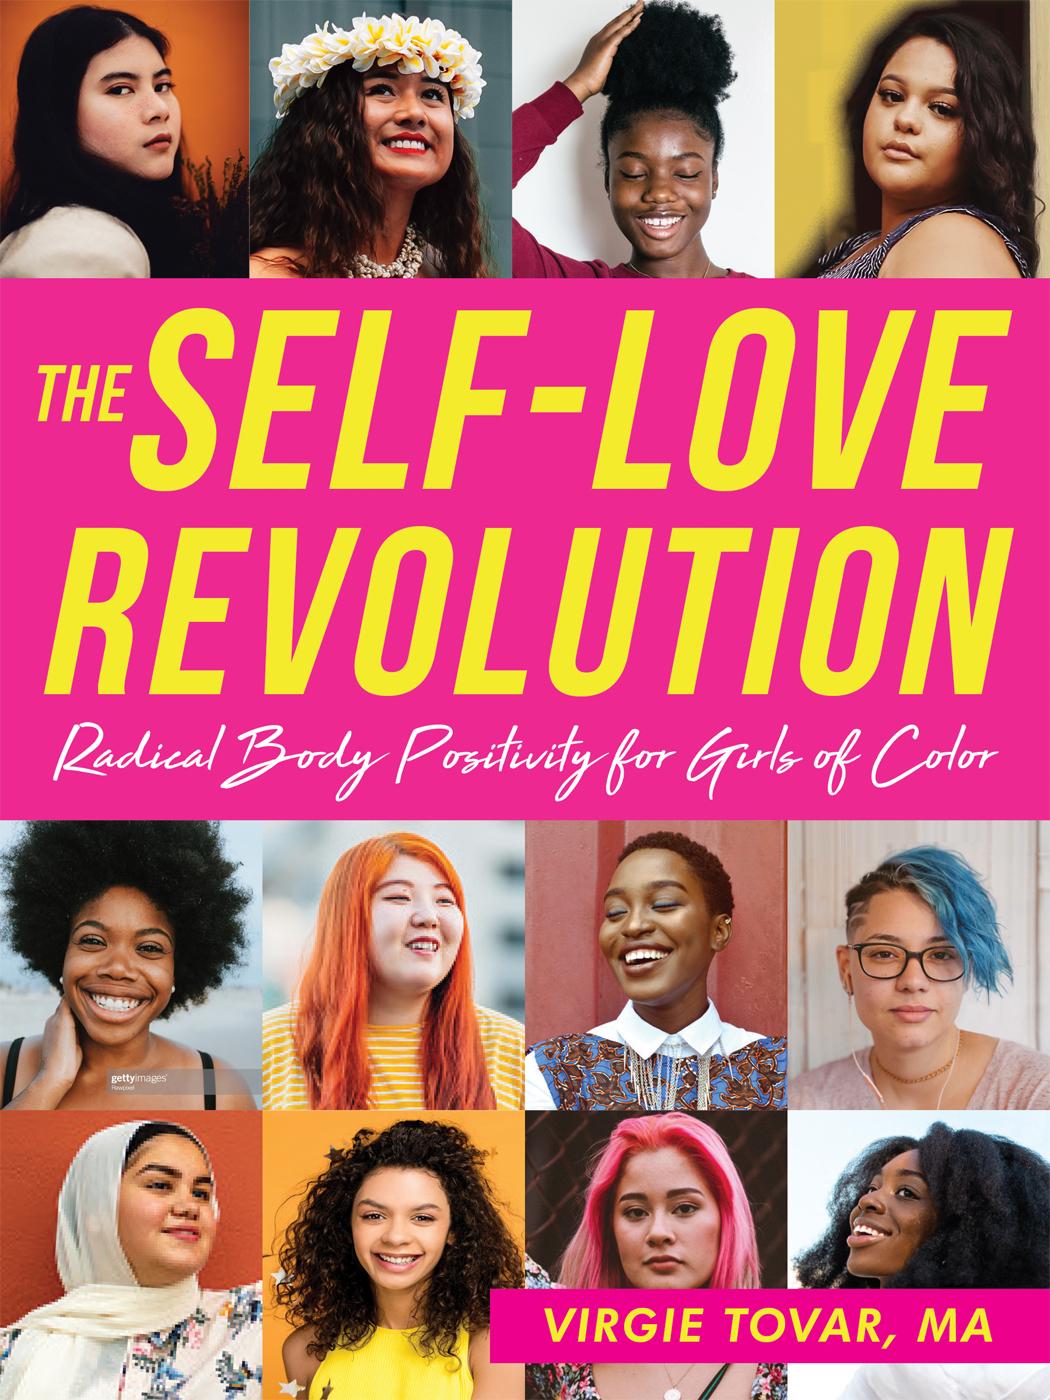 The Self-Love Revolution: Radical Body Positivity for Girls of Color